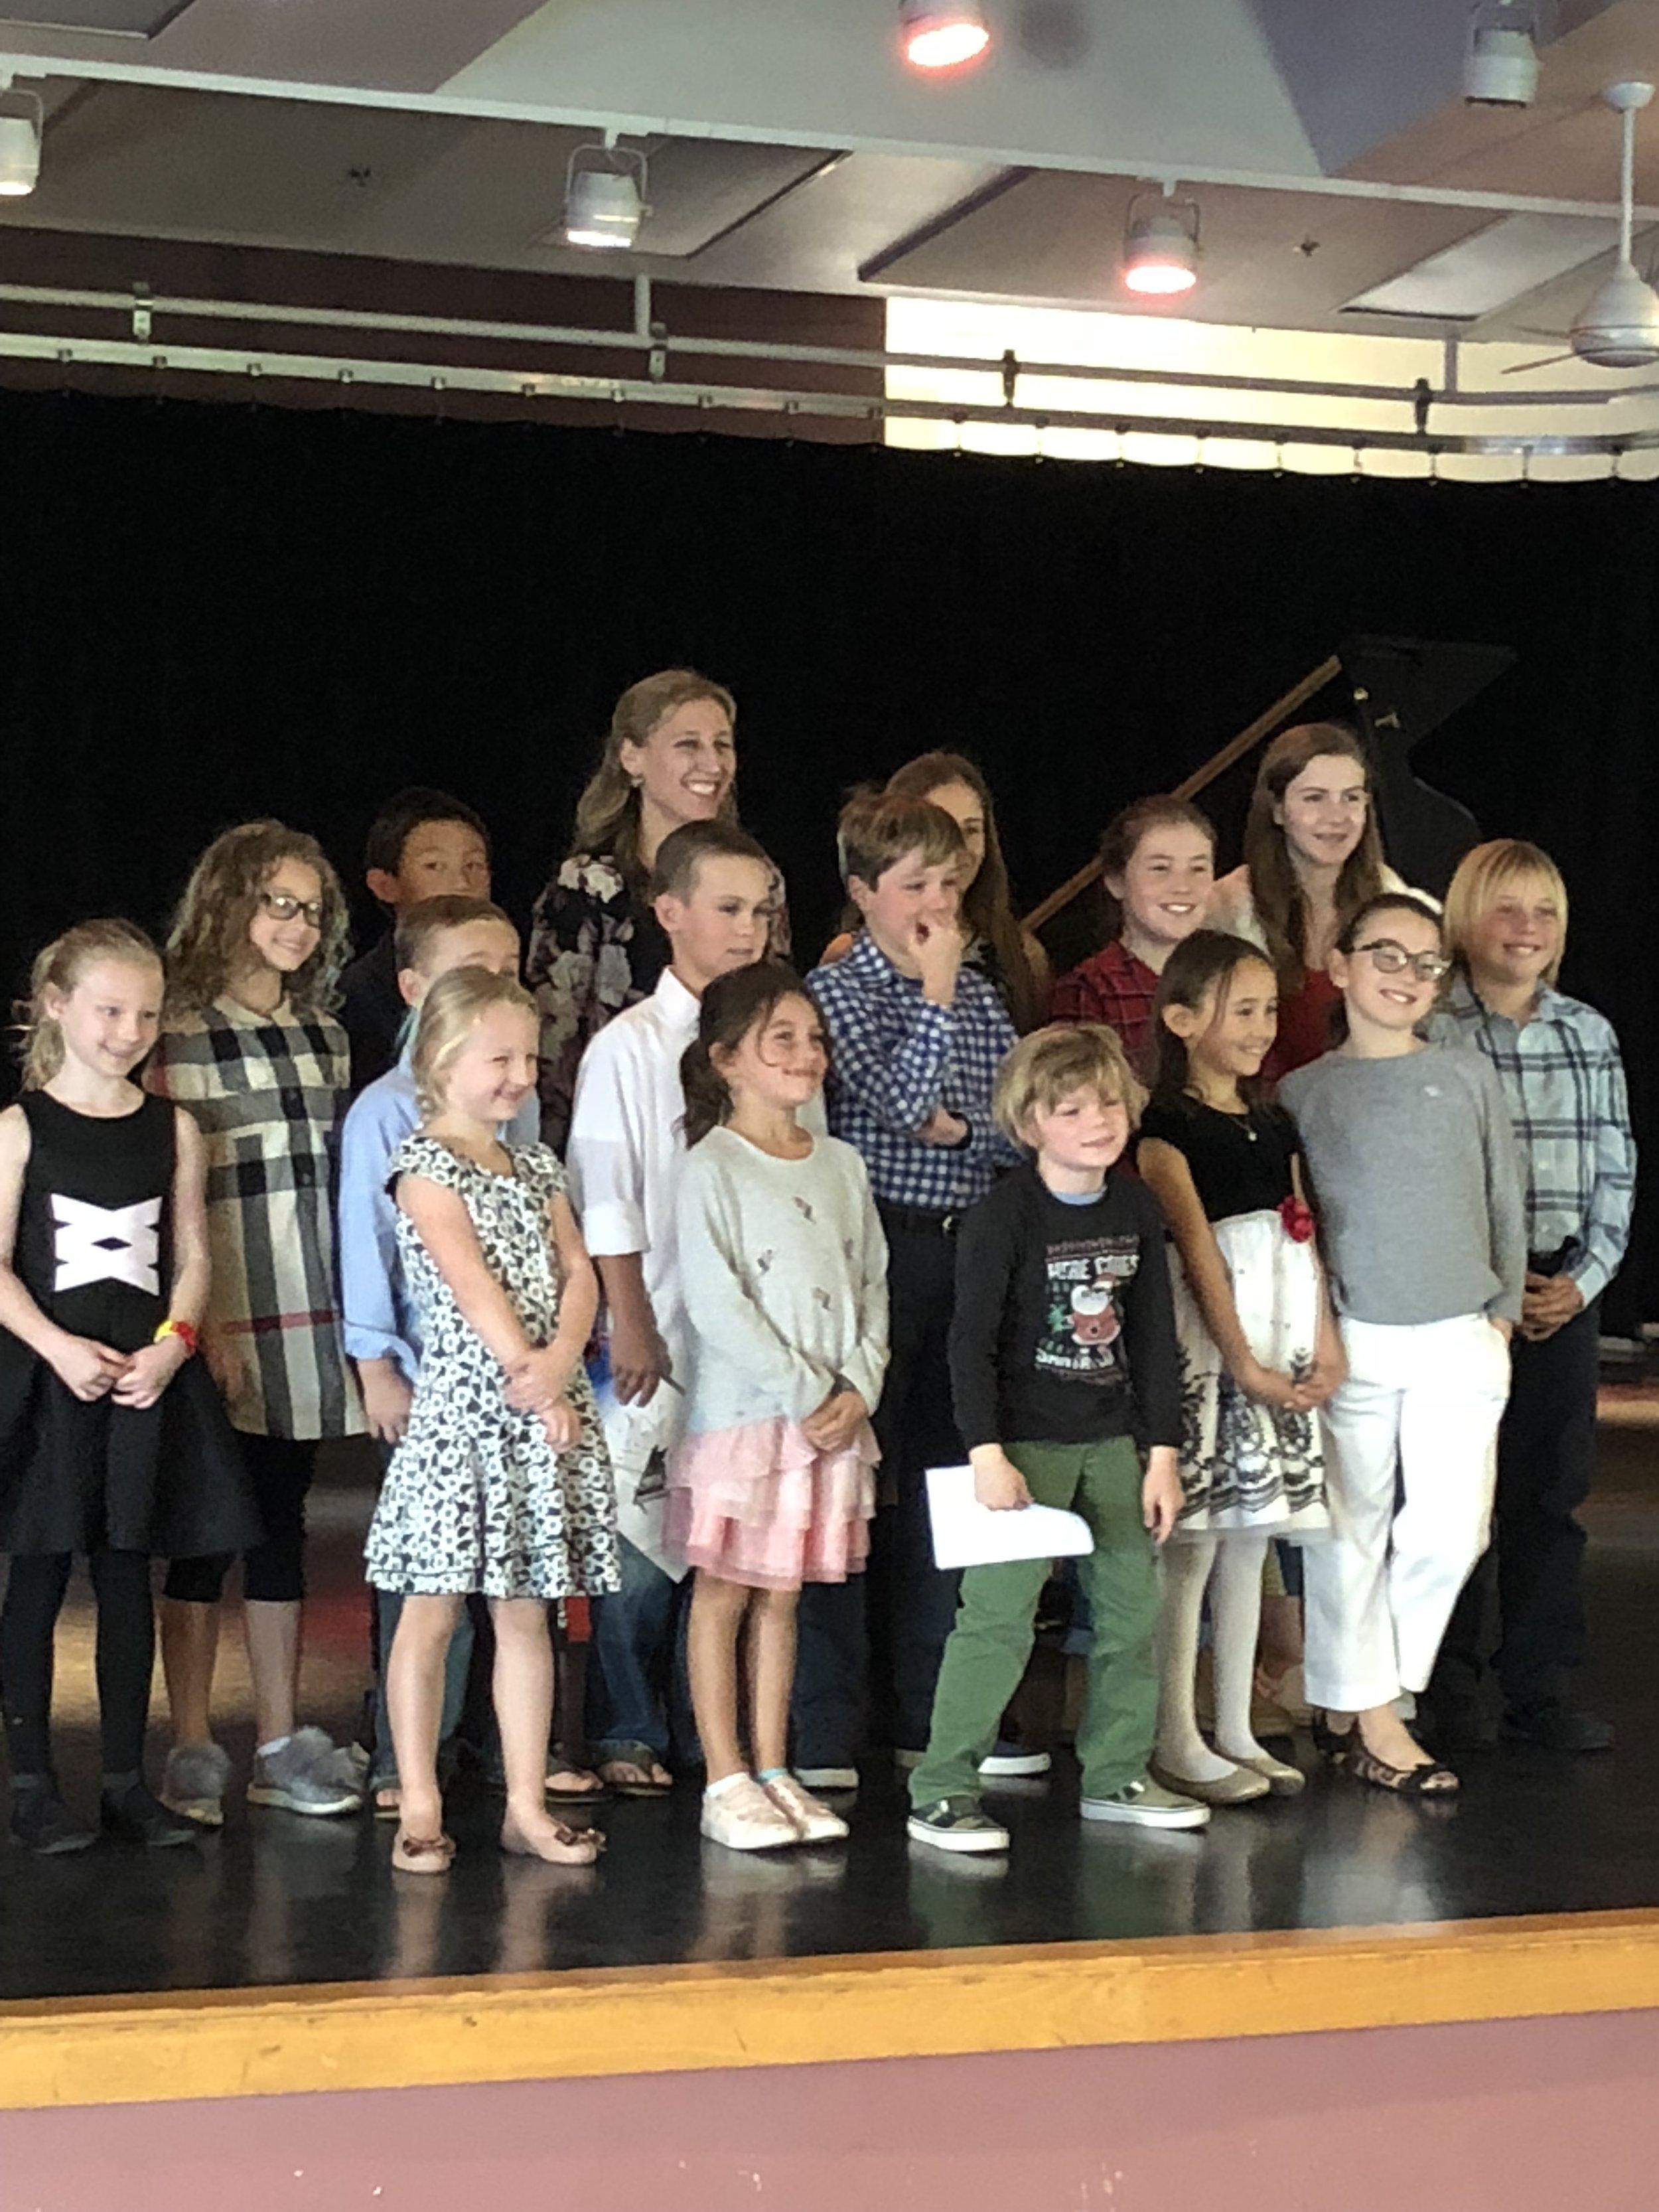 Winter 2018 (Group B) at Coronado Middle School